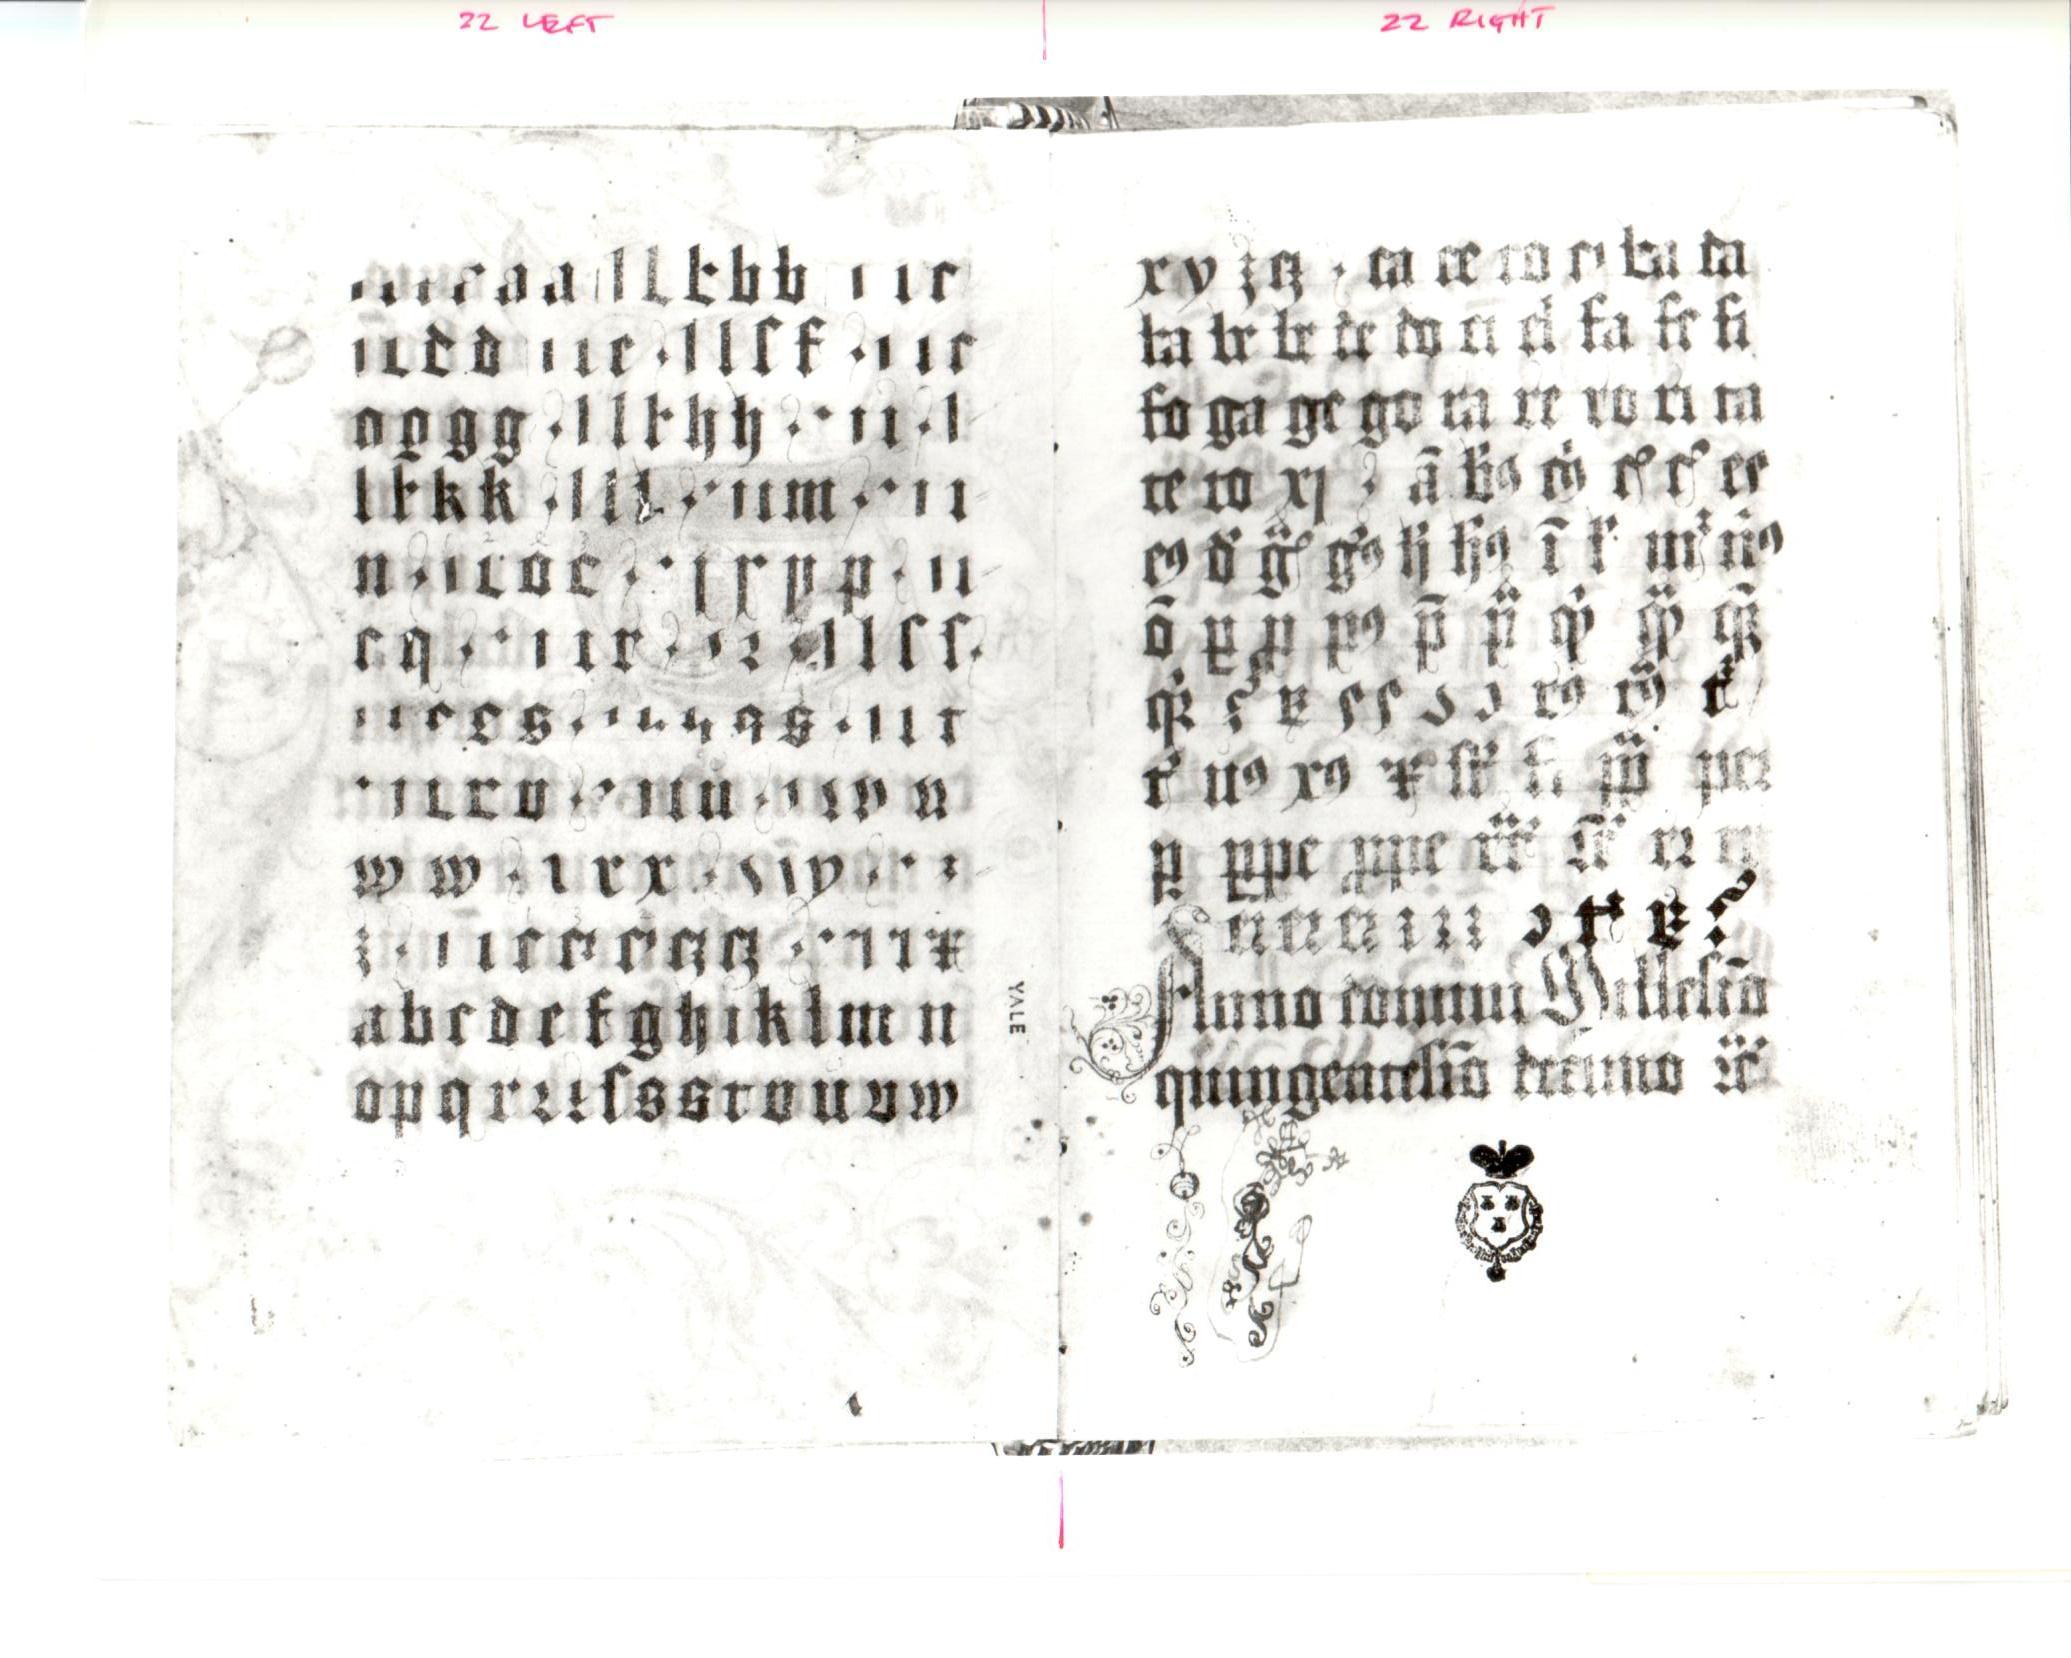 22. Beinecke MS 439, ff. 1v-2r